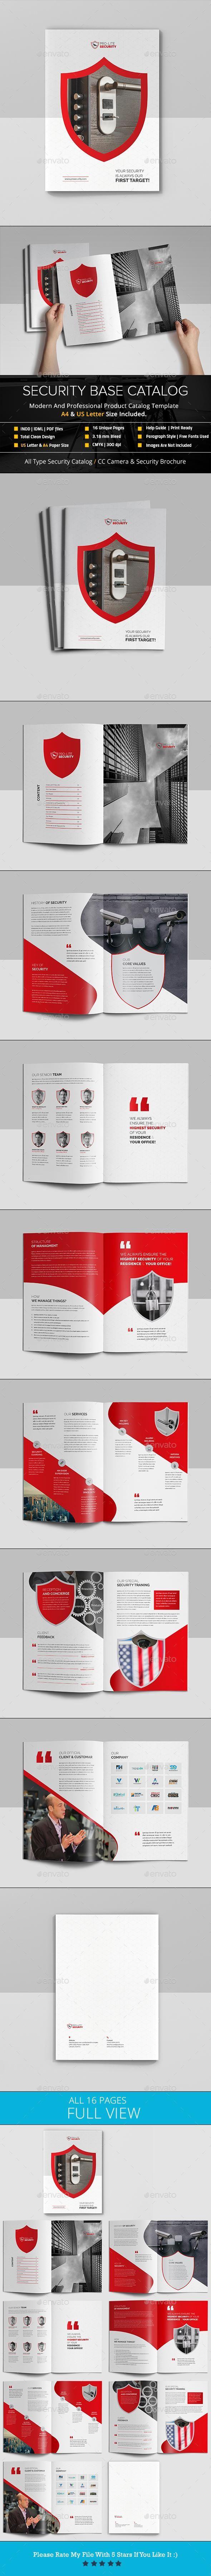 security base catalog brochure graphicdesign brochuretempate